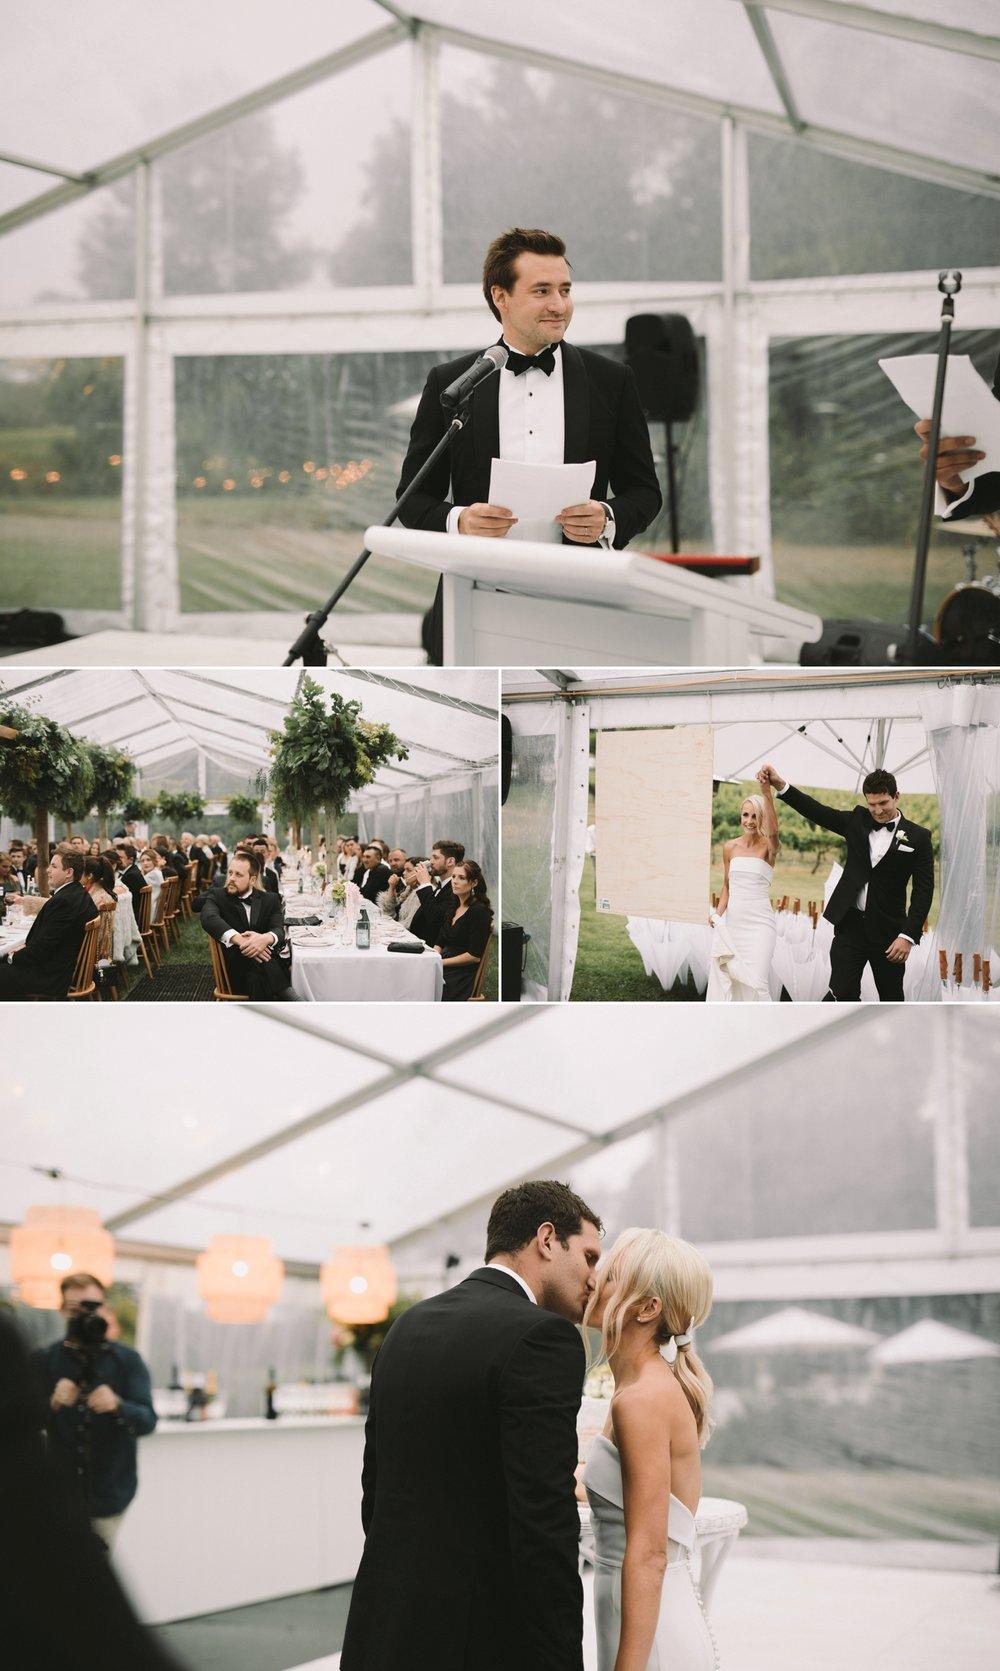 Rebecca & Daniel - Adelaide Hills Private Property Wedding Photographer - Fine Art Wedding Photographer Australia - Katherine Schultz - www.katherineschultzphotography.com_0064.jpg